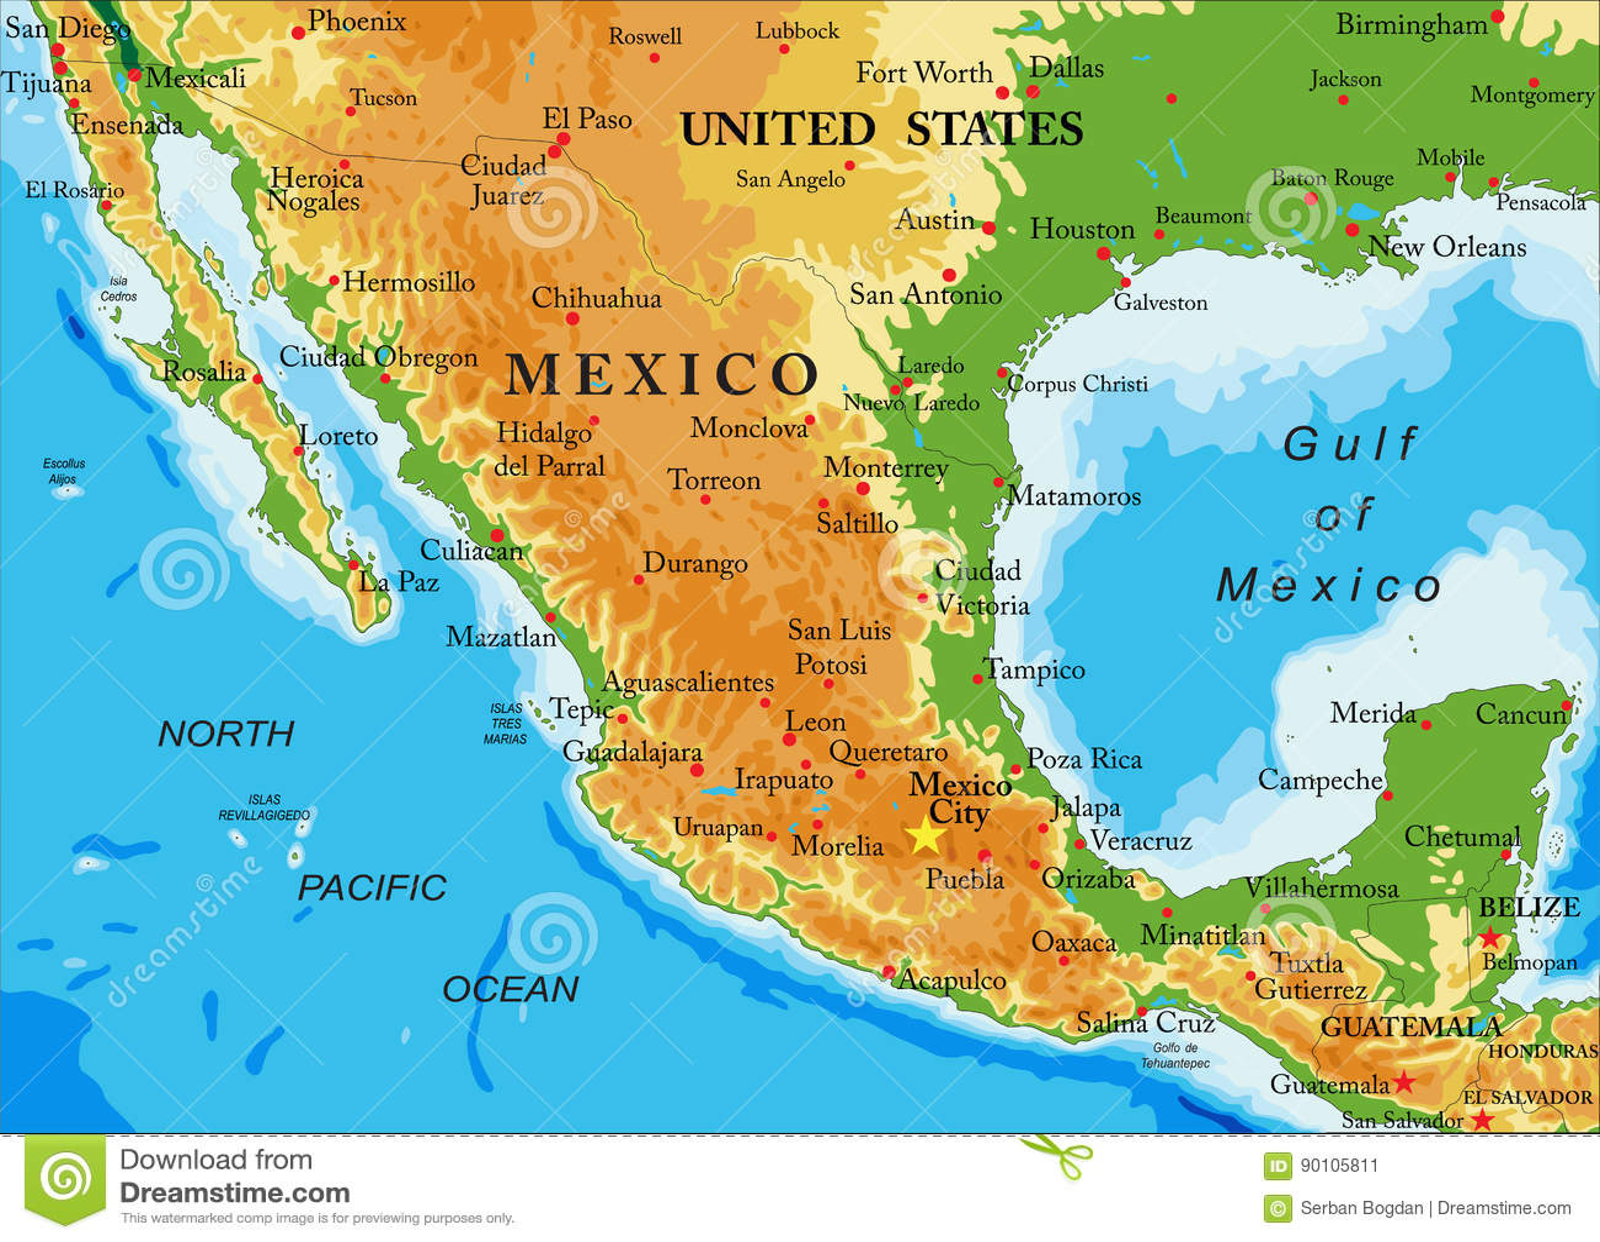 Mexico Relief Map Stock Vector Illustration Of Honduras